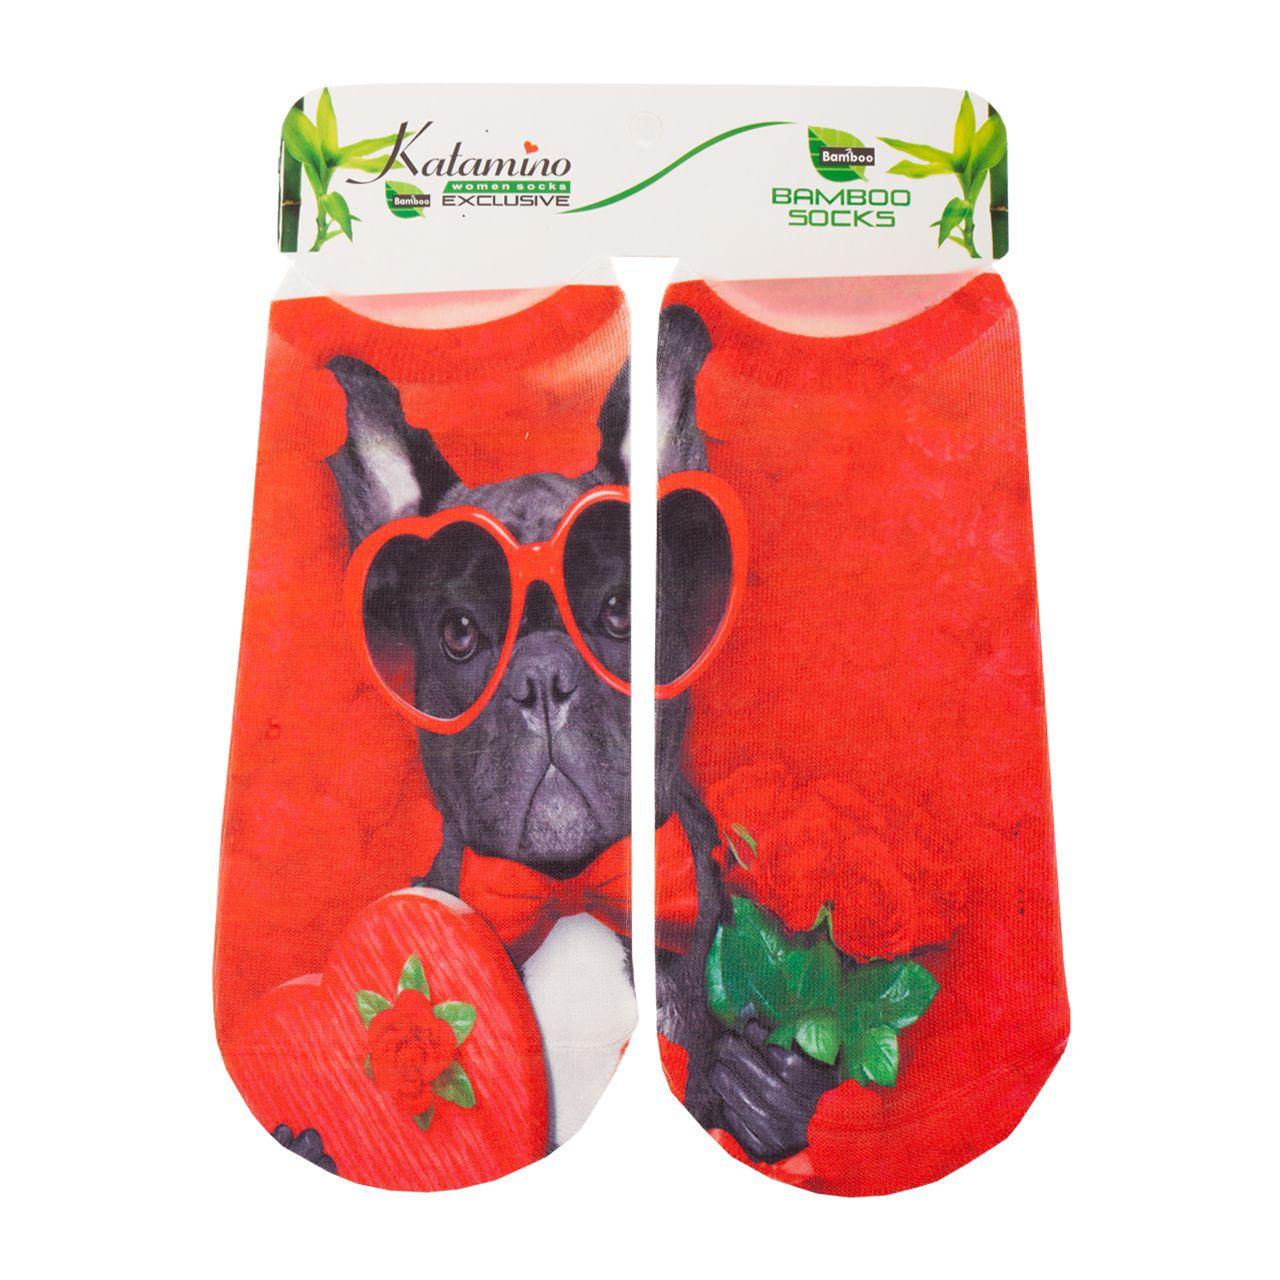 جوراب دخترانه کاتامینو طرح سگ جنتلمن  -  - 3